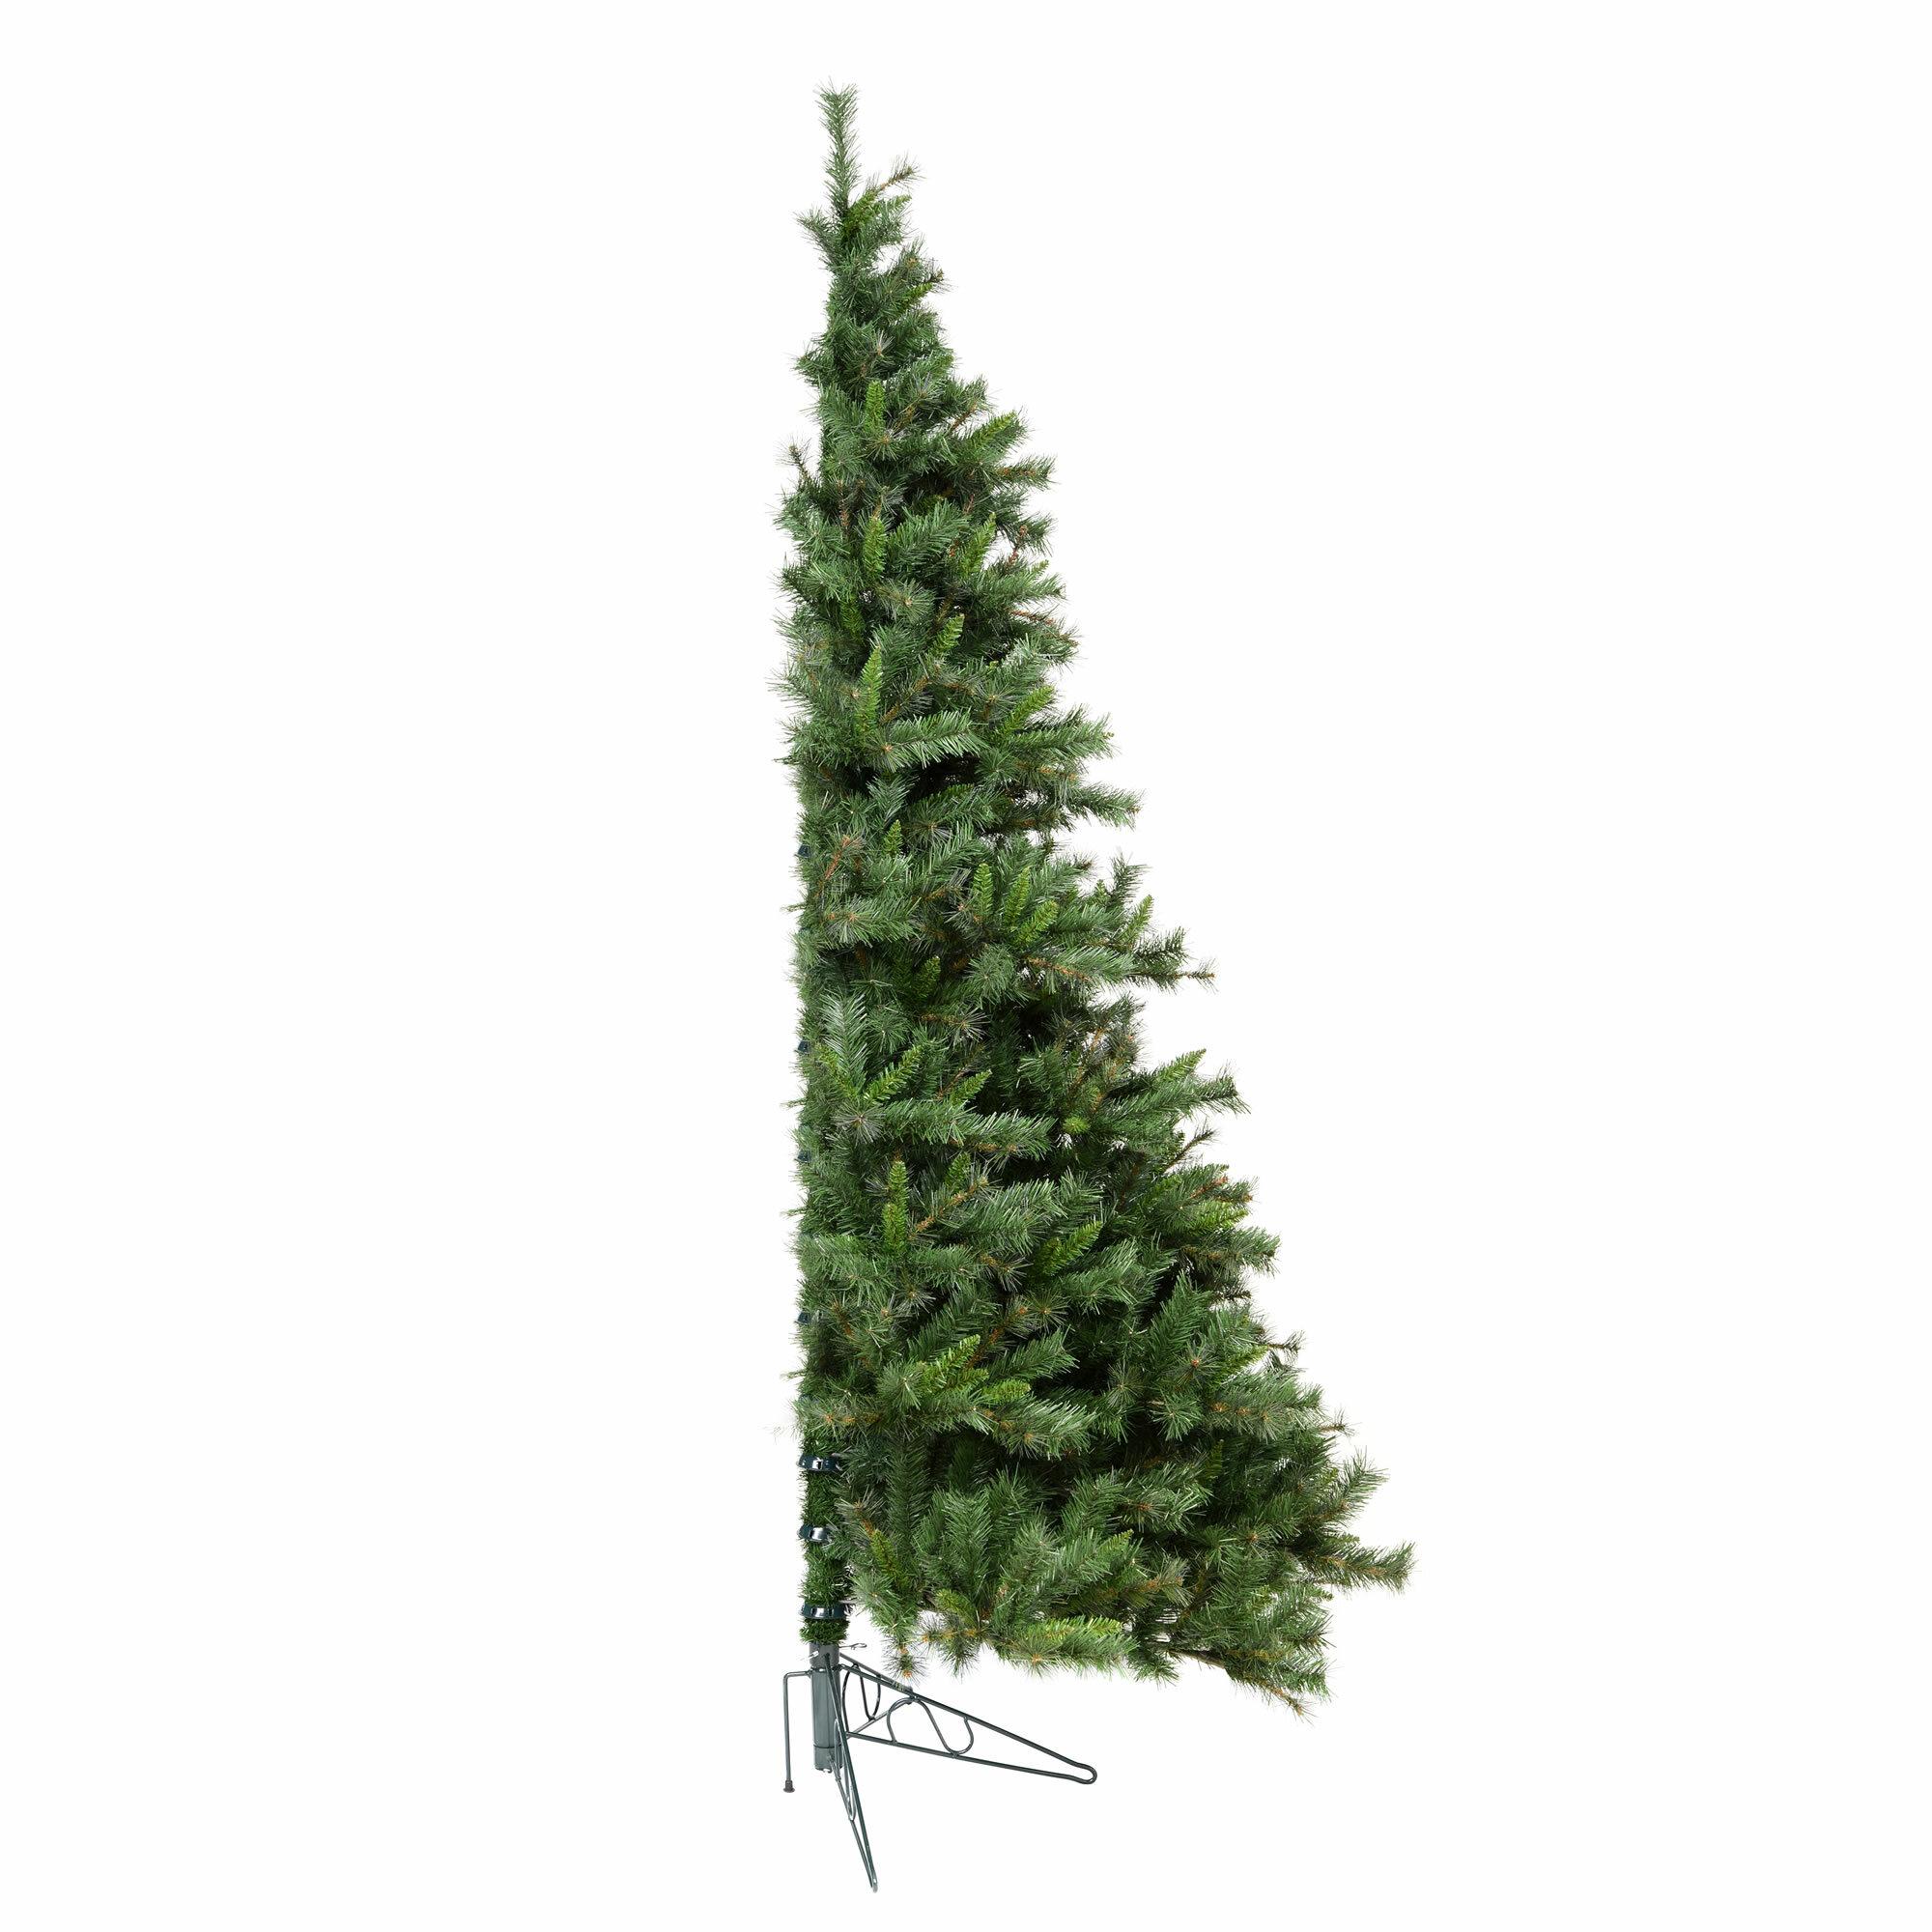 Christmas Trees Artificial.Minnesota Pine Vickerman 90 Green Pine Trees Artificial Christmas Tree